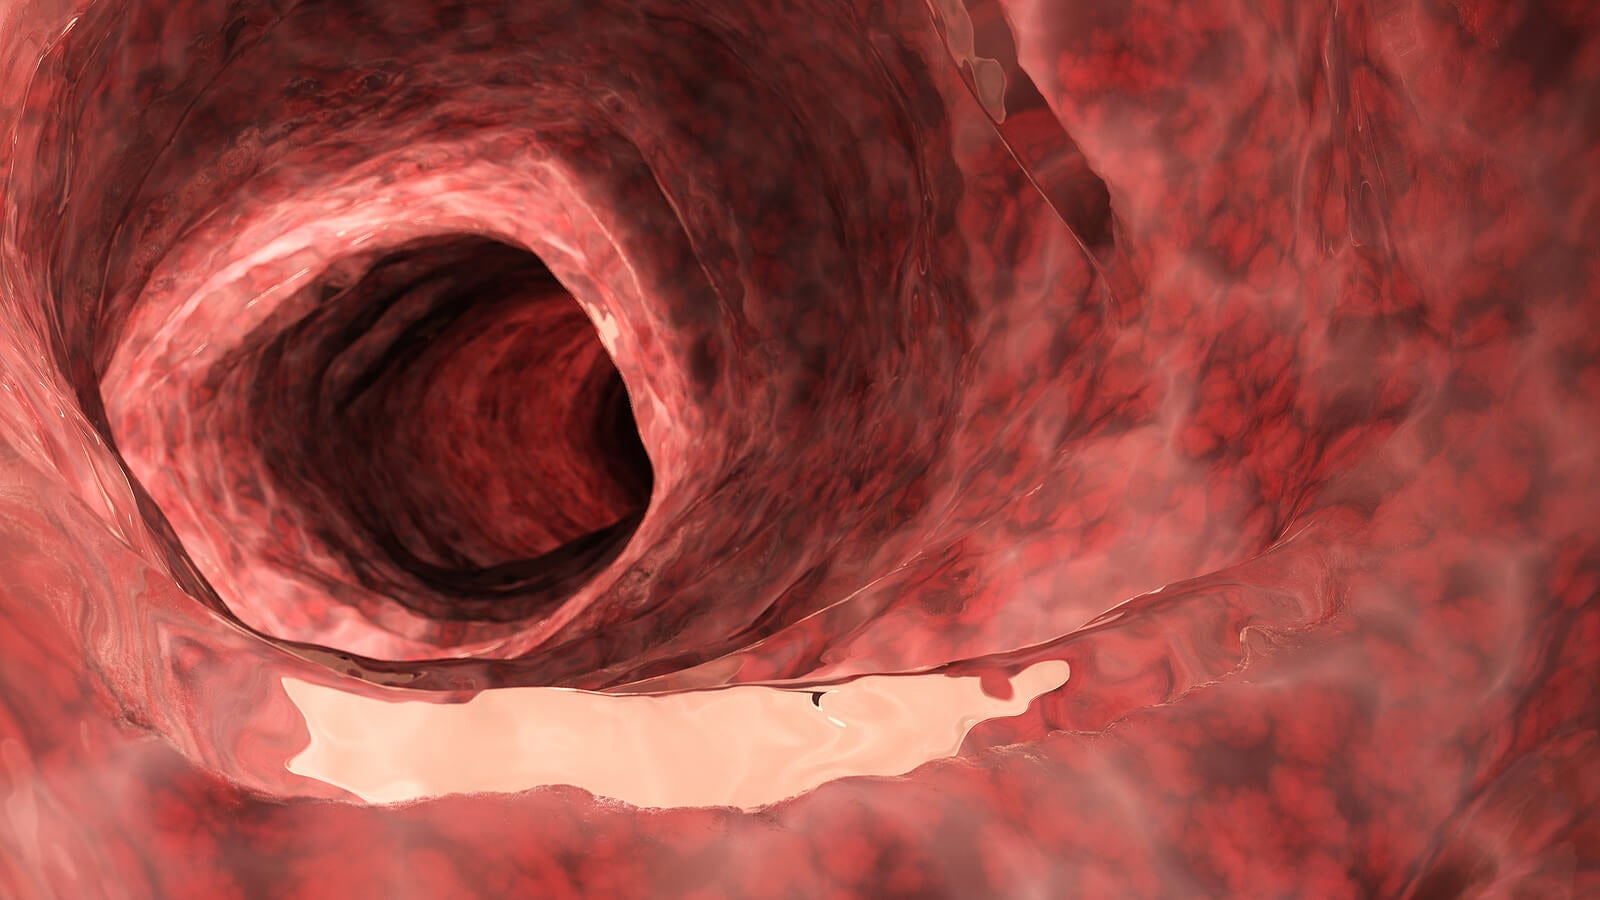 Diagnosis of ulcerative colitis includes endoscopy